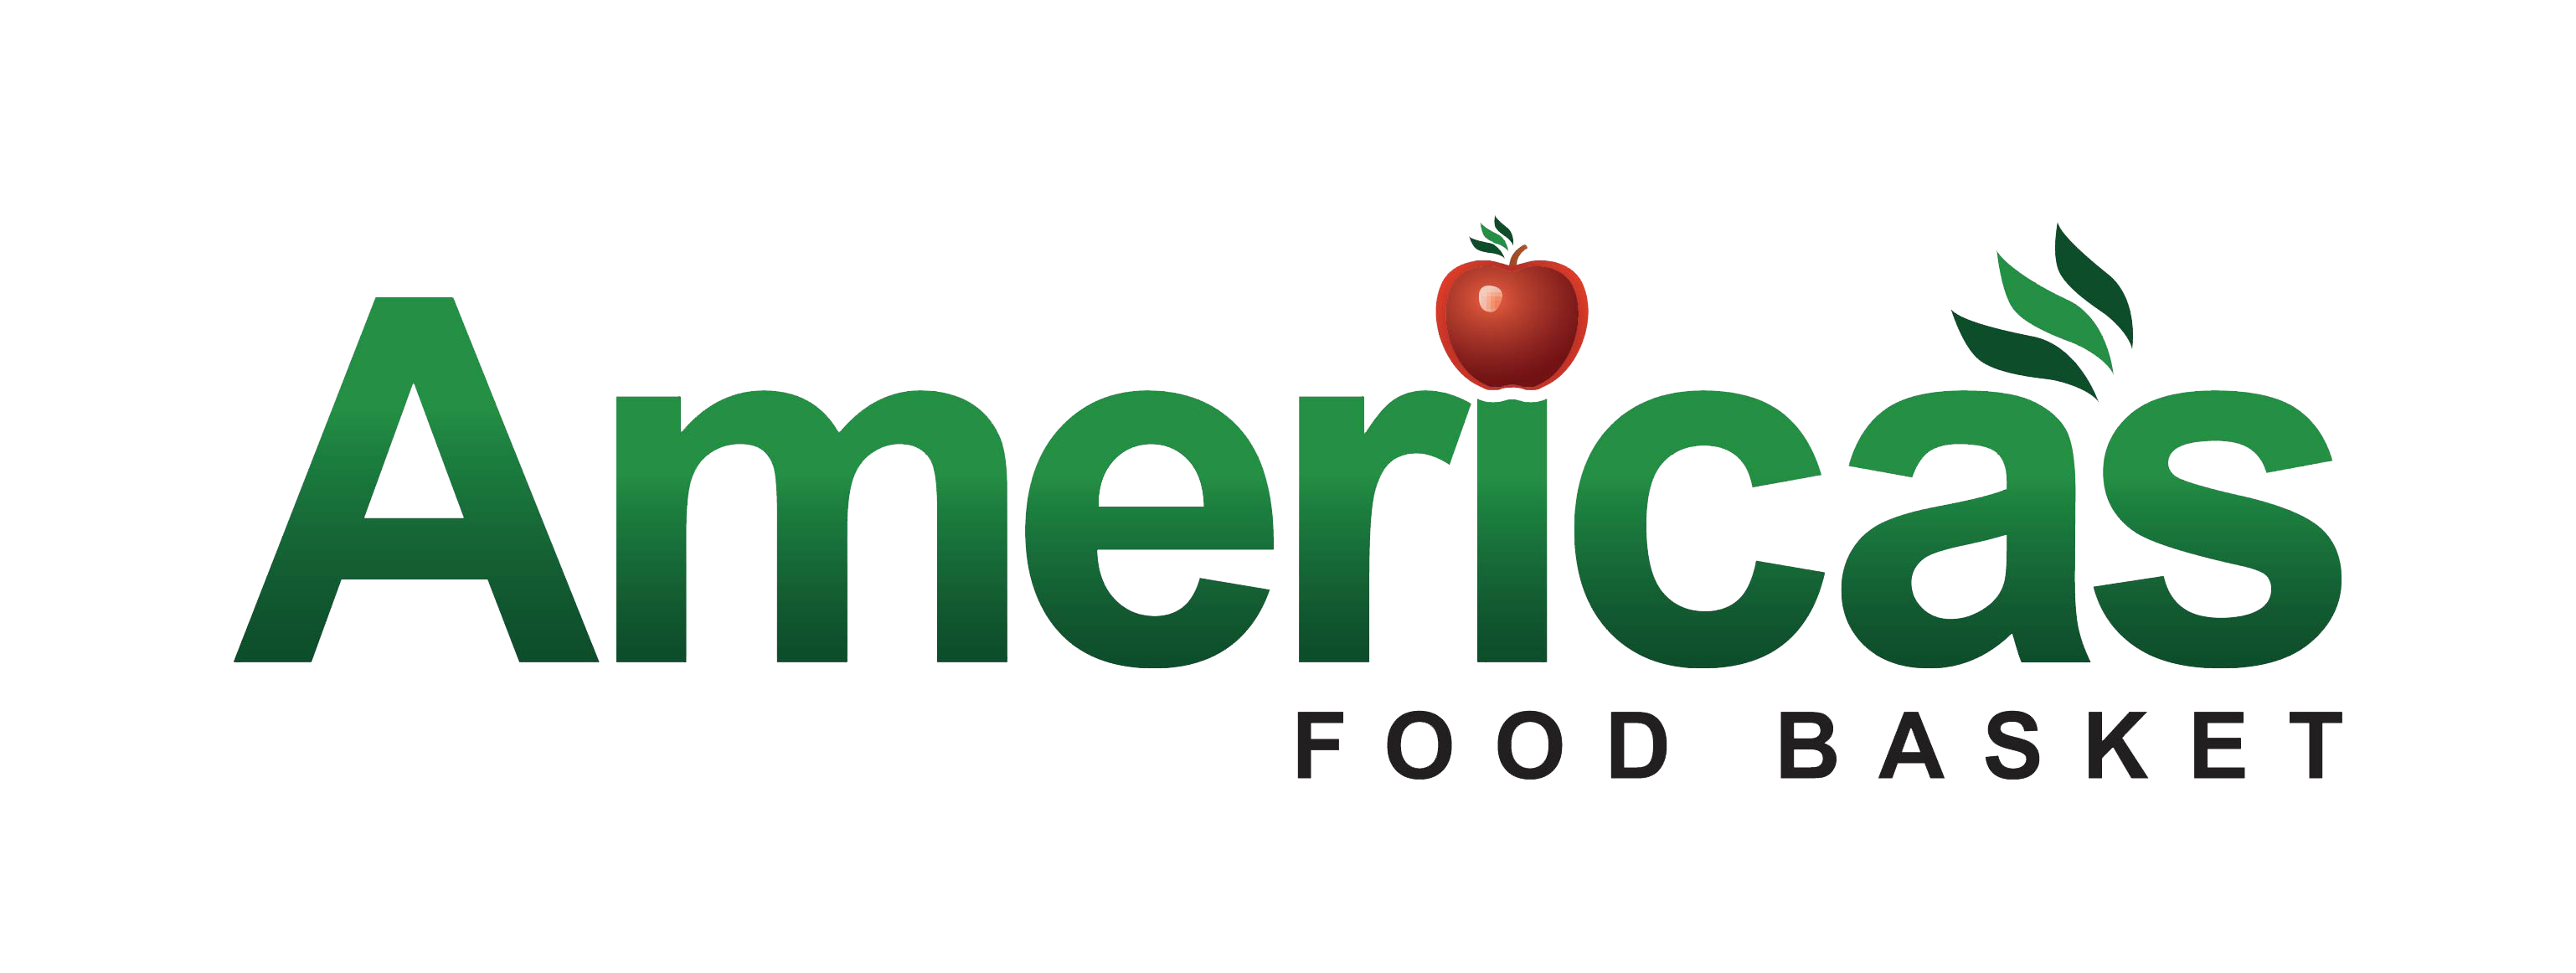 America's Food Basket logo